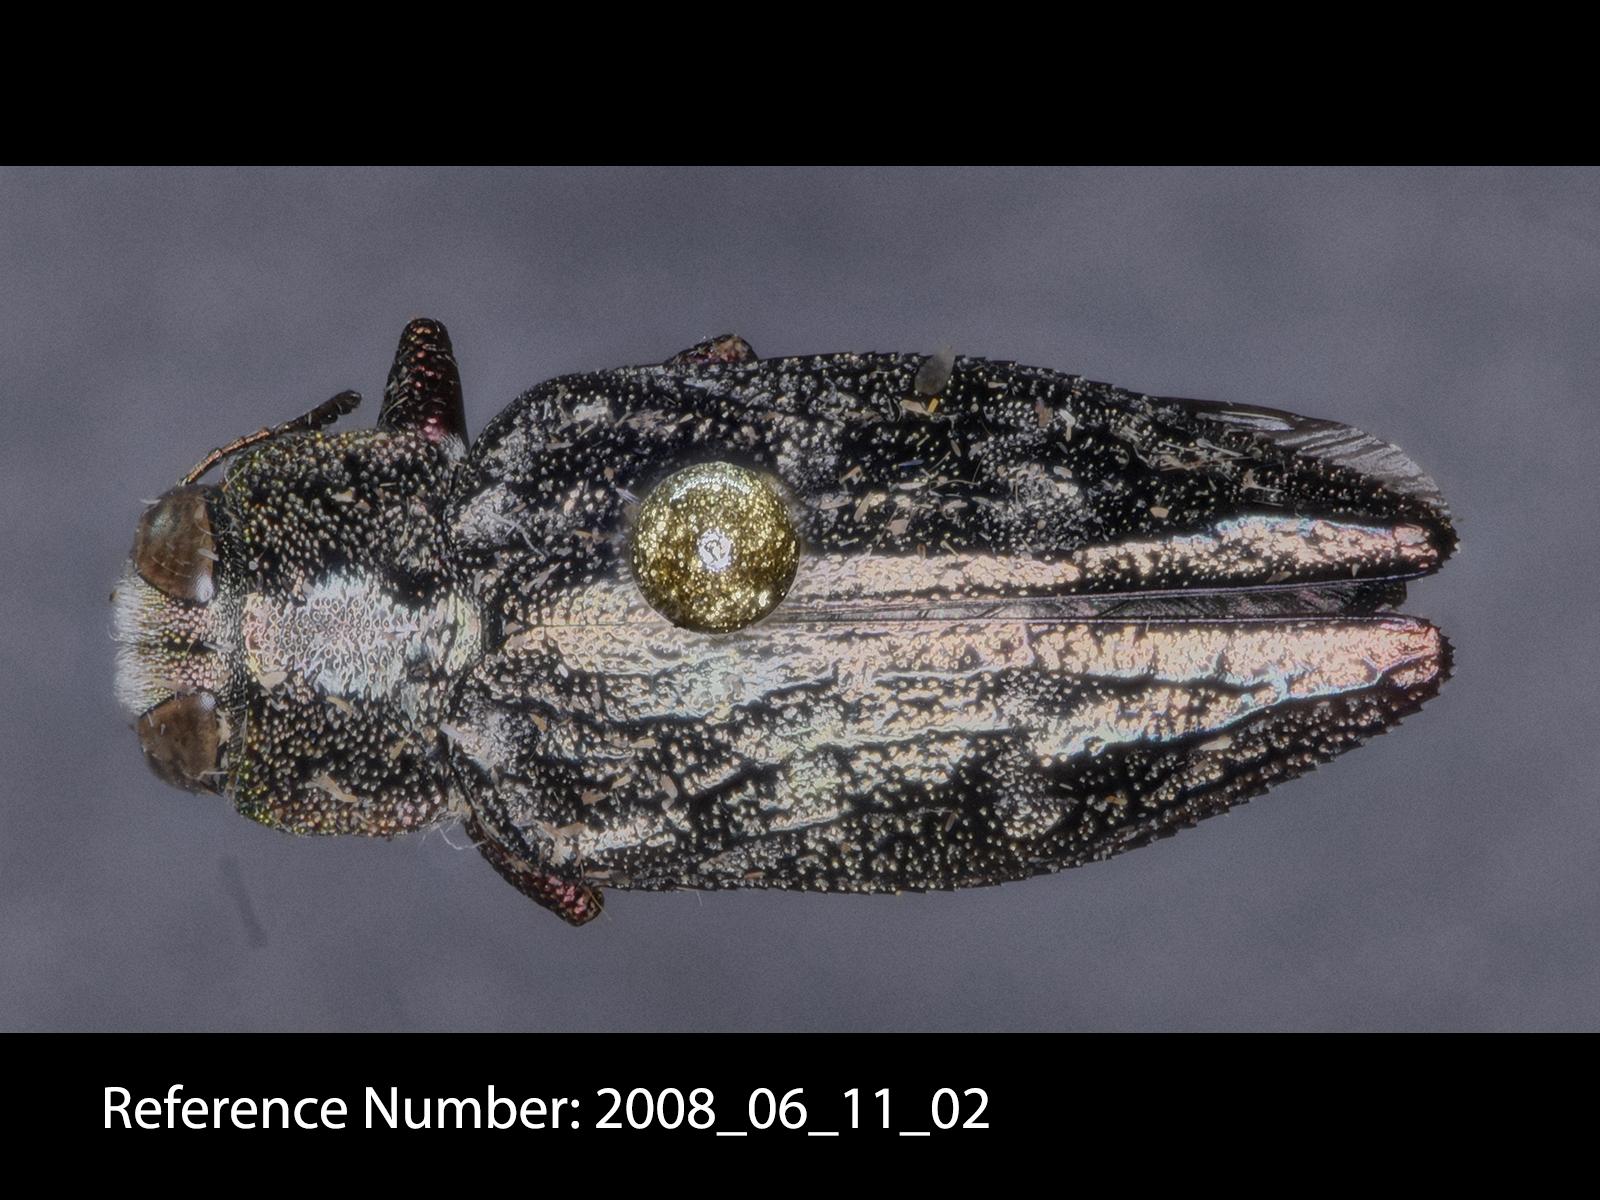 Chrysobothris femorata dorsal view